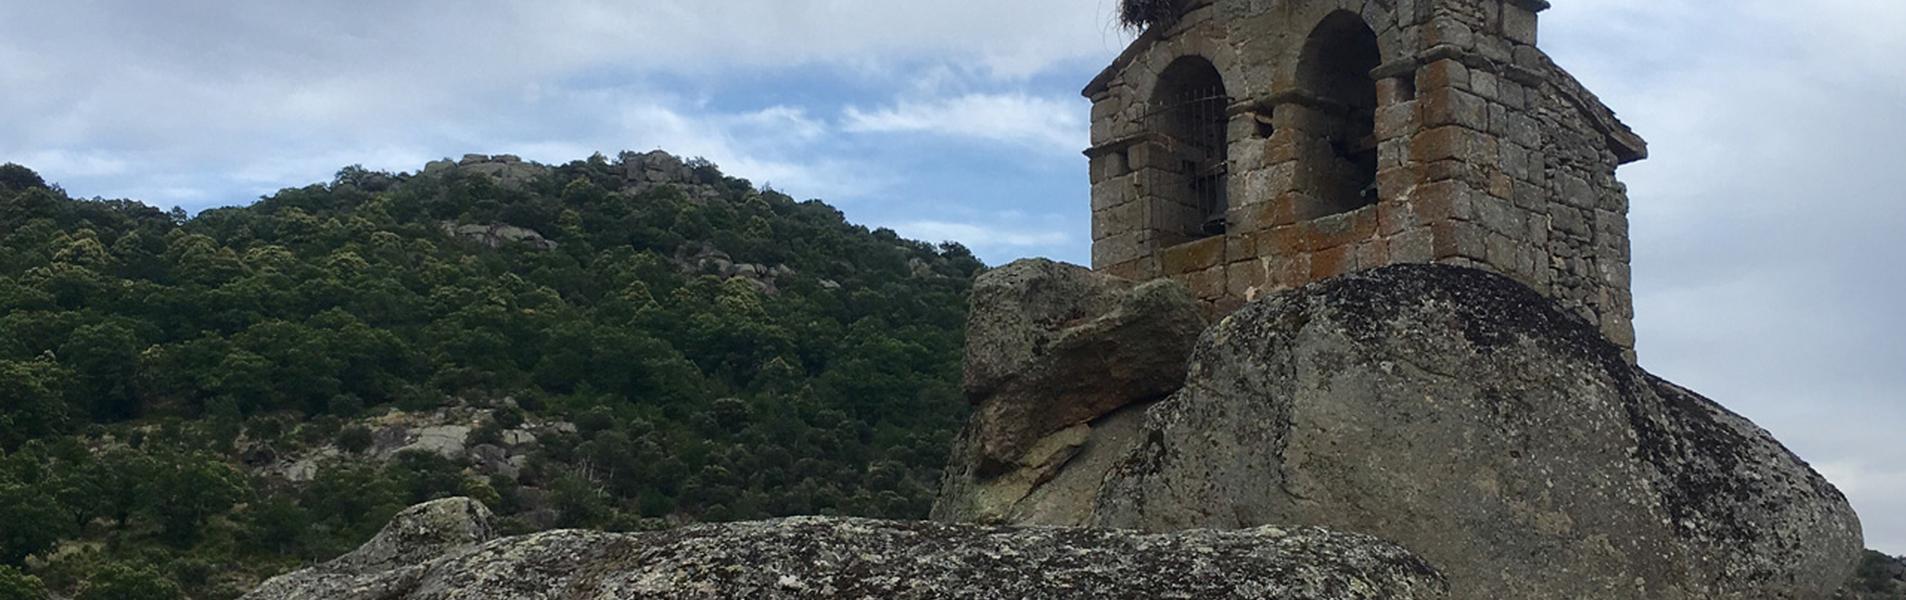 Neila de San Miguel